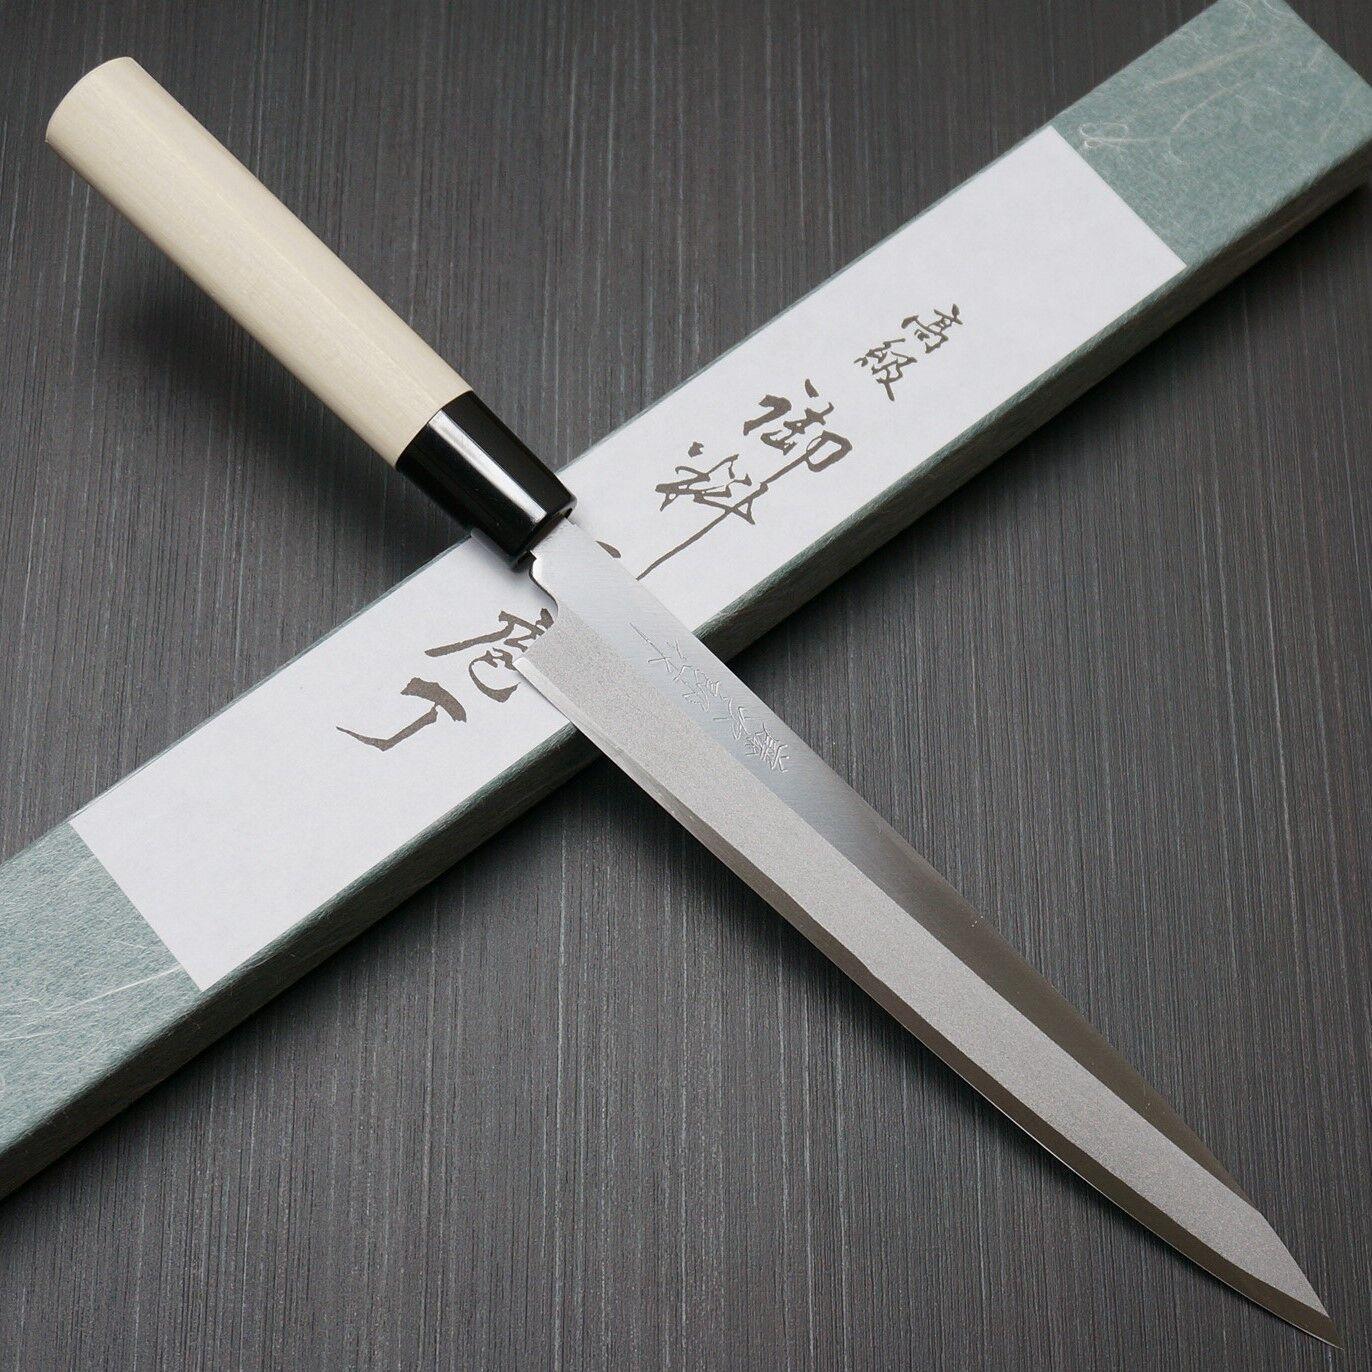 Japonais Tojiro shirogami Acier sushi sashimi Yanagiba Knife 210 mm F-930 Japon